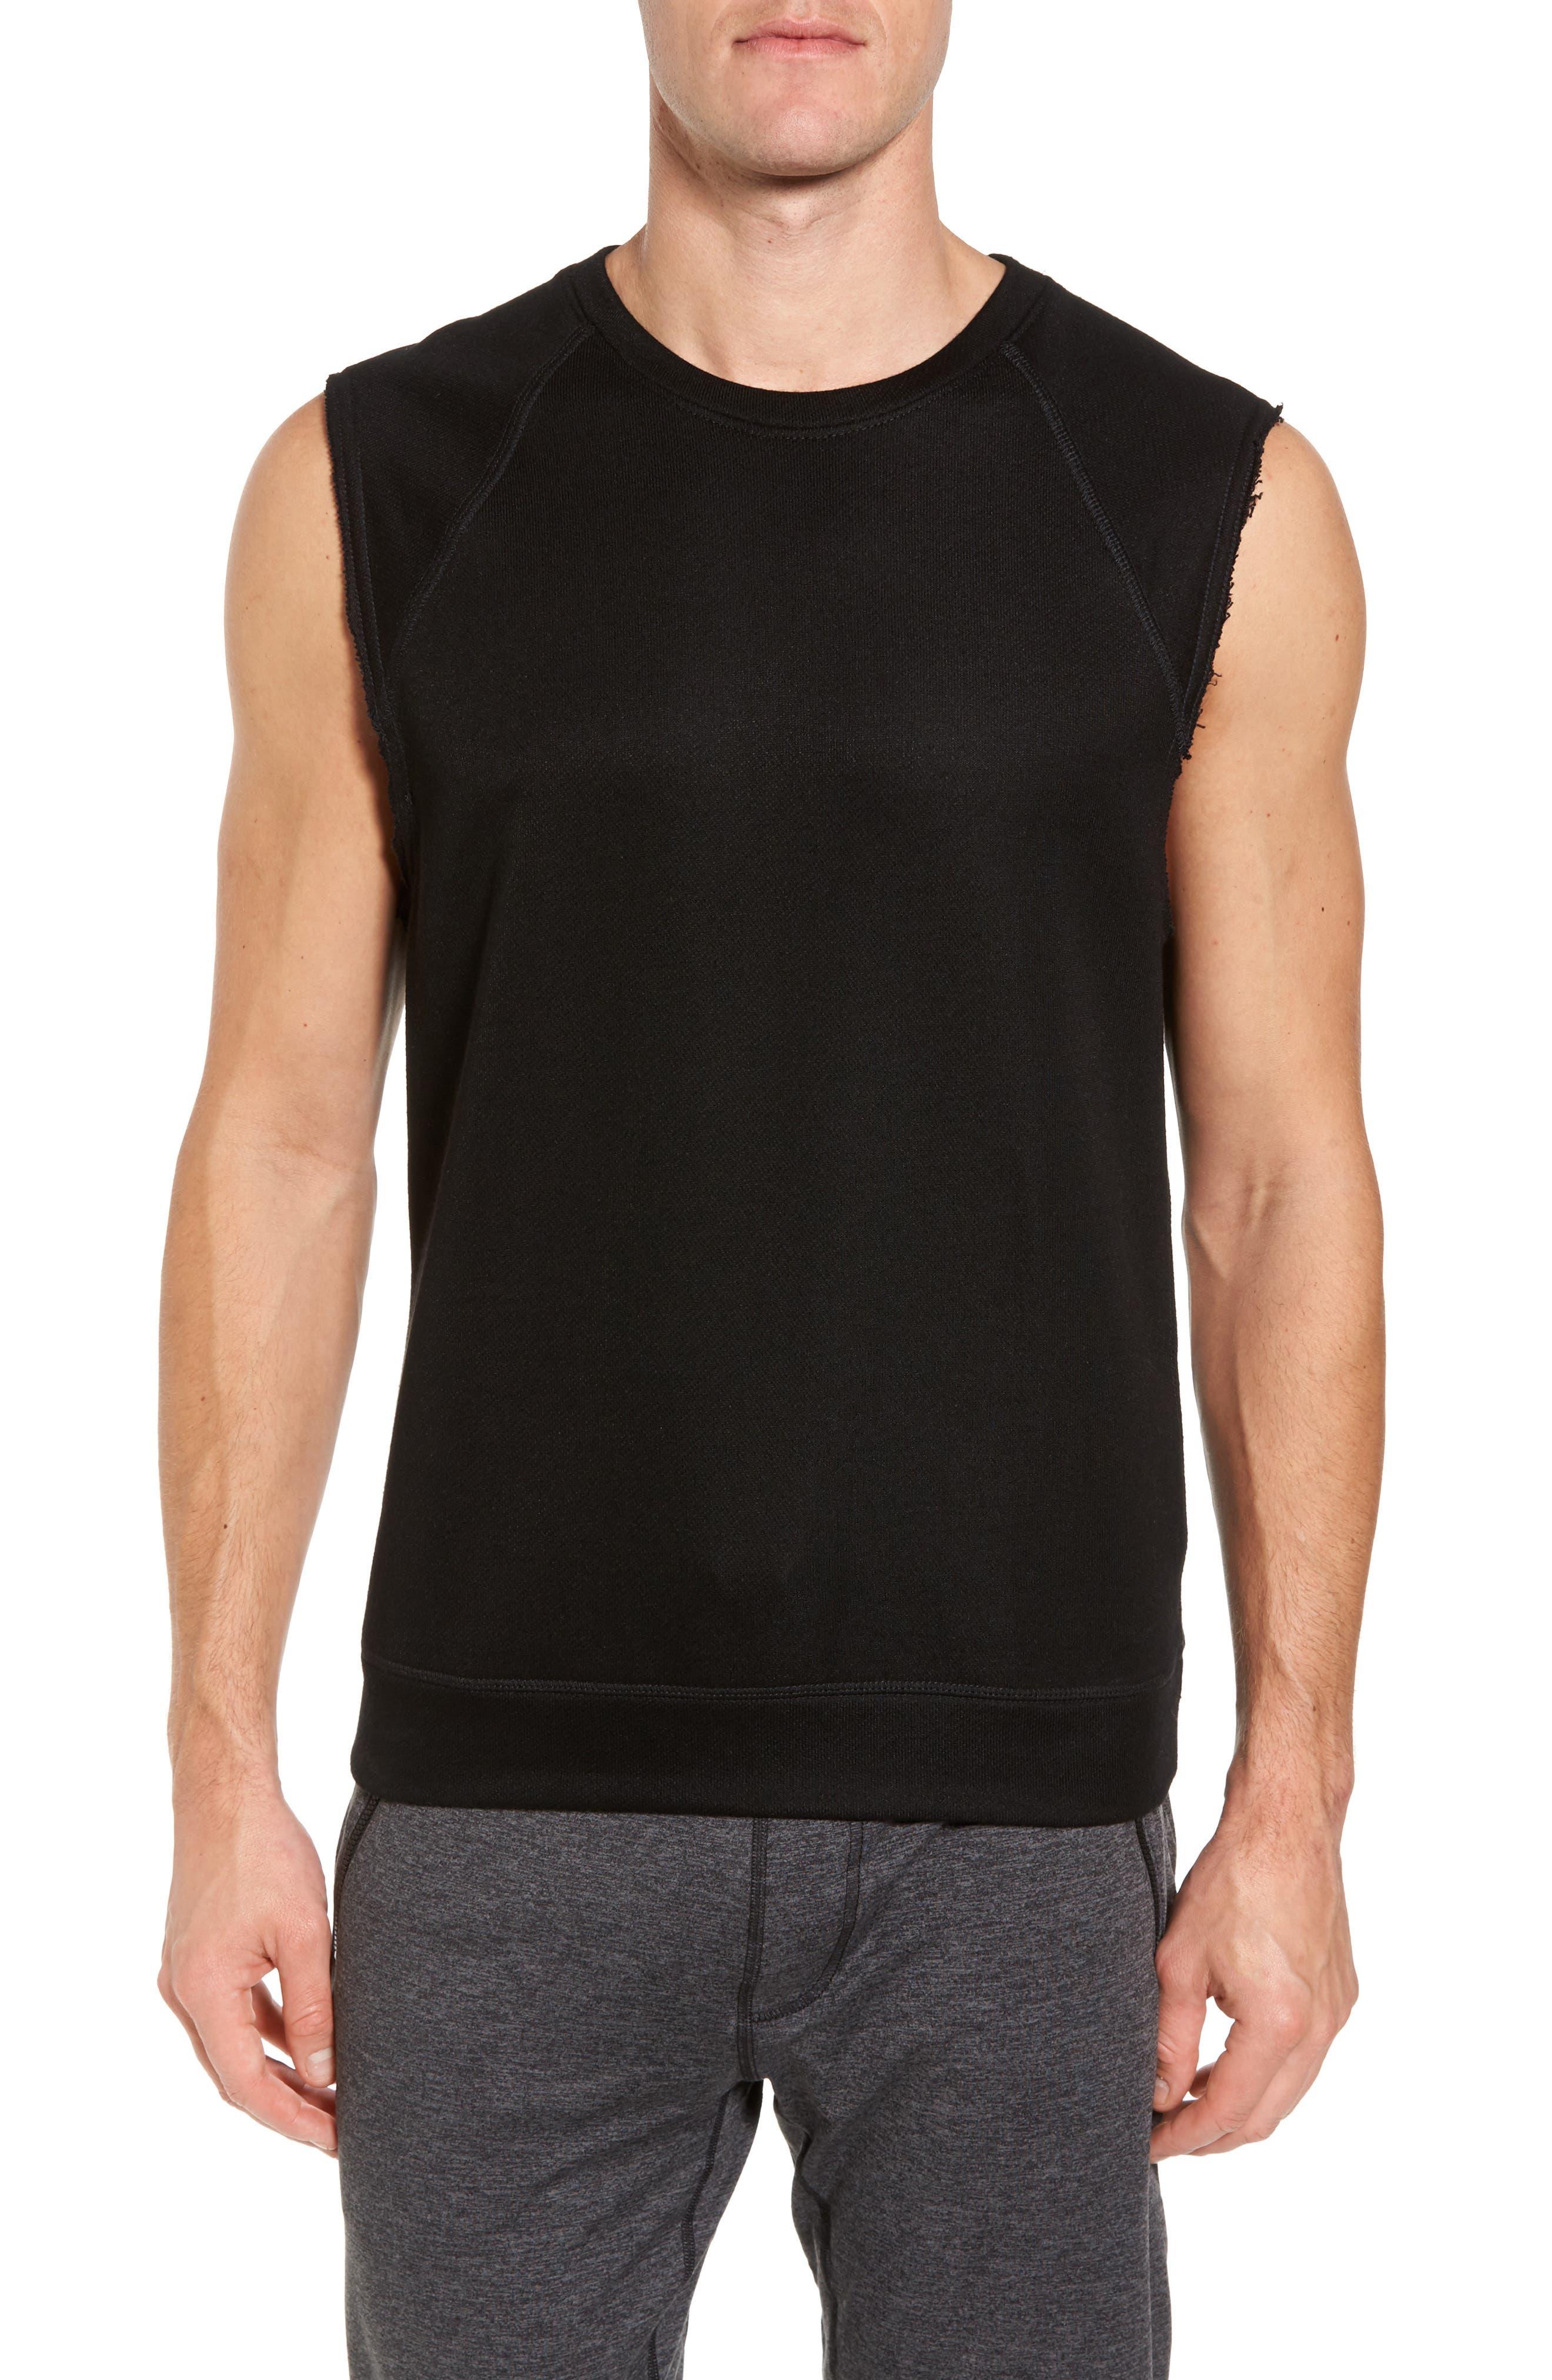 Dosha Relaxed Fit Sweatshirt Tank,                         Main,                         color, BLACK